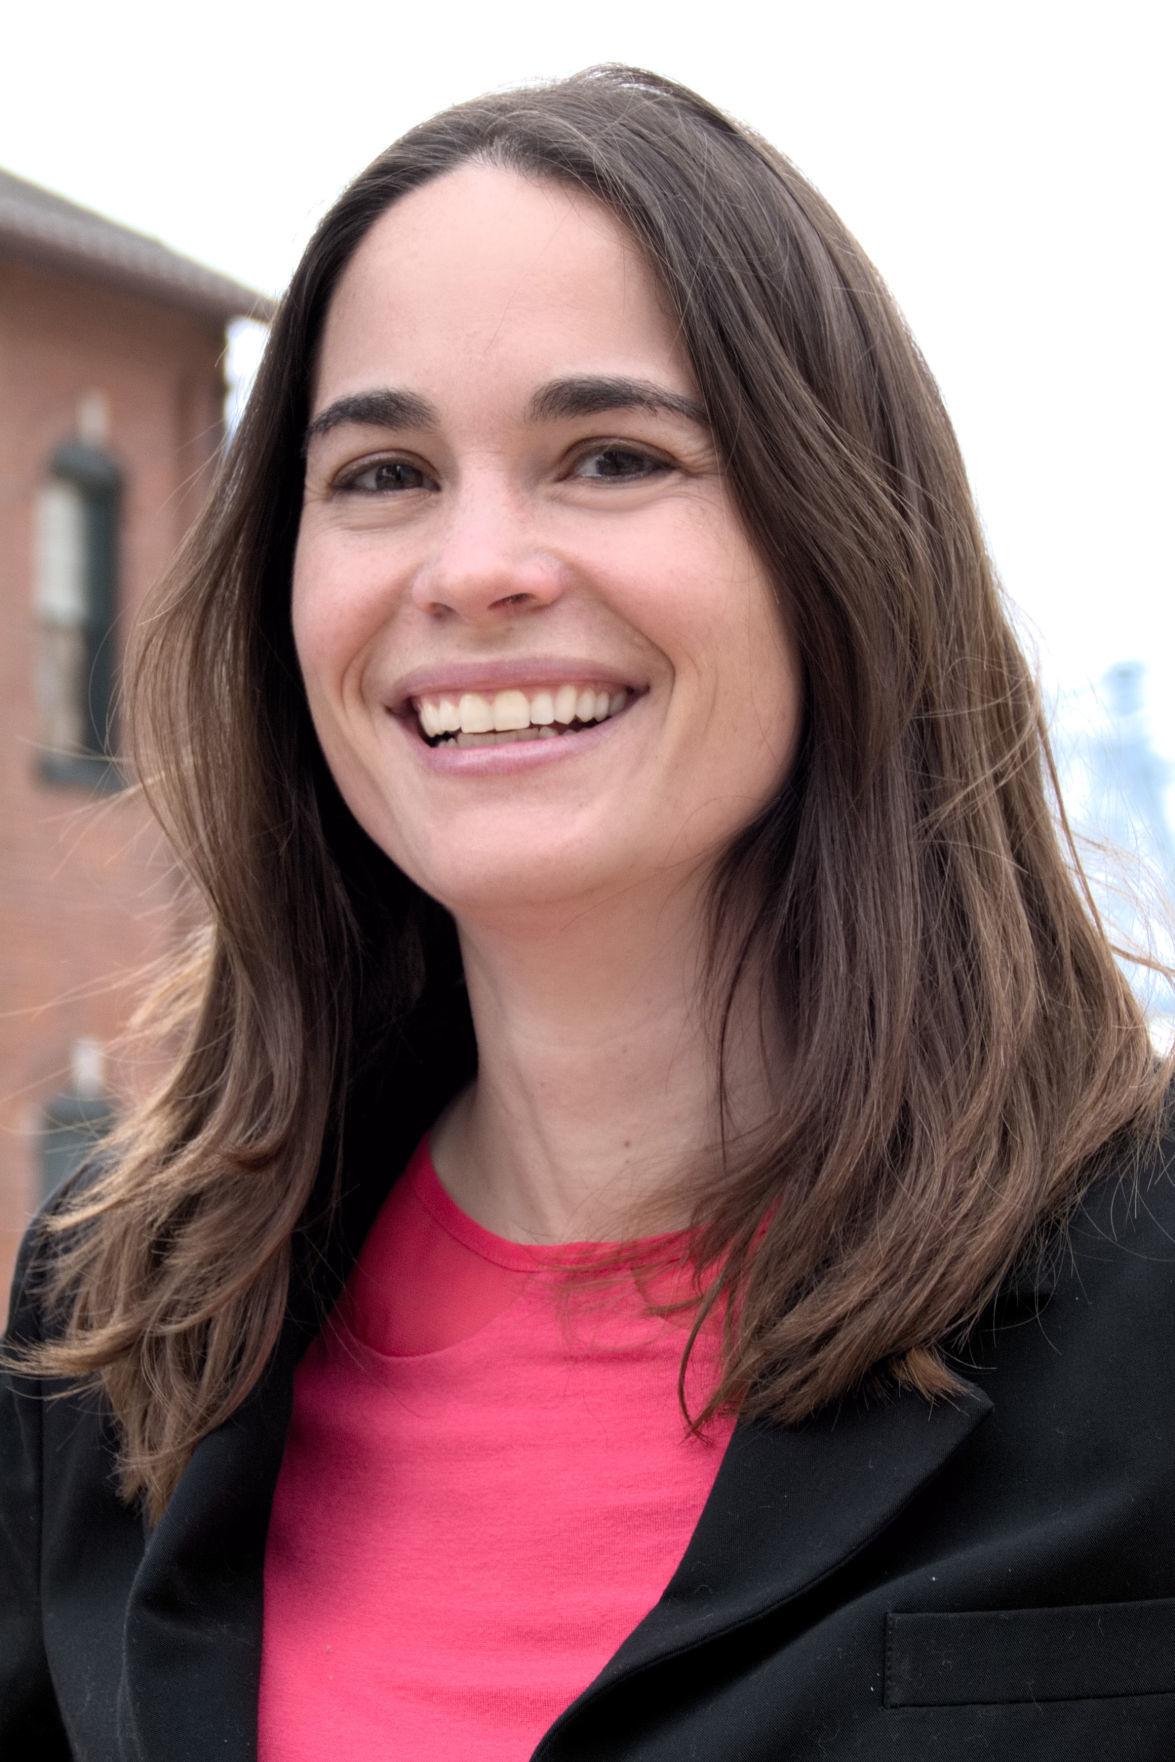 City of La Crosse community development coordinator Caroline Gregerson